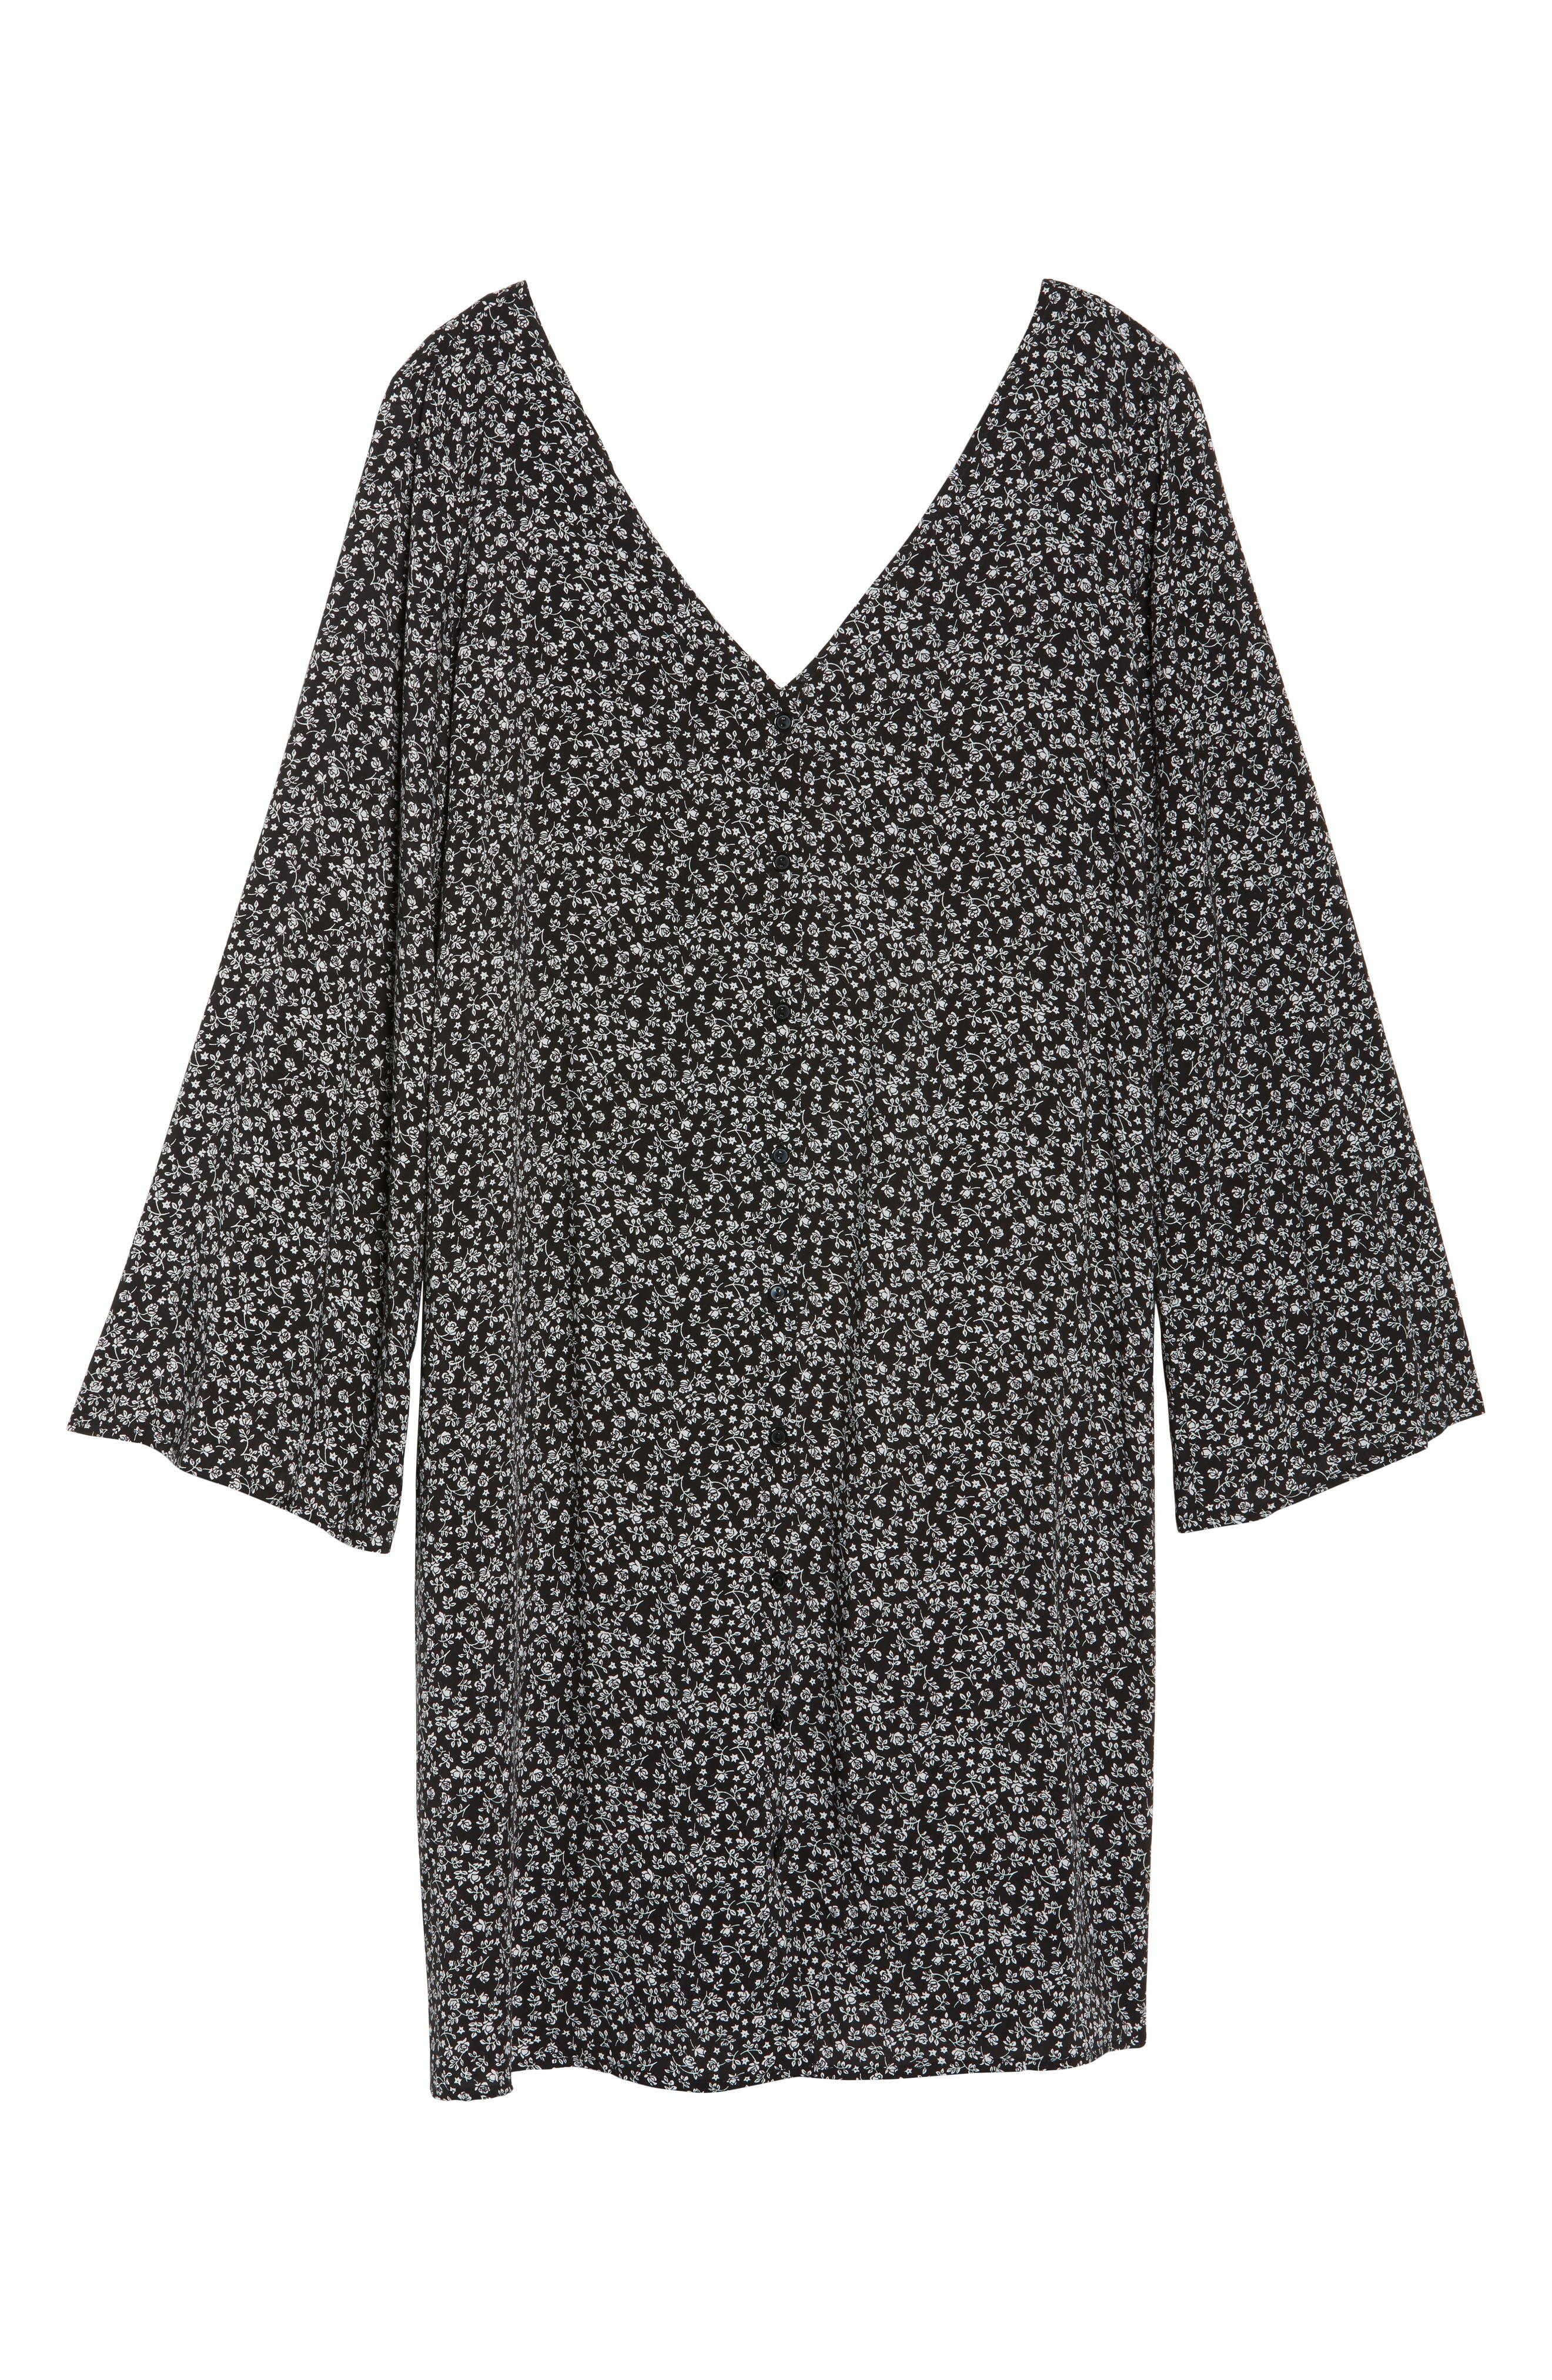 Double V-Neck Print Shift Dress,                             Alternate thumbnail 6, color,